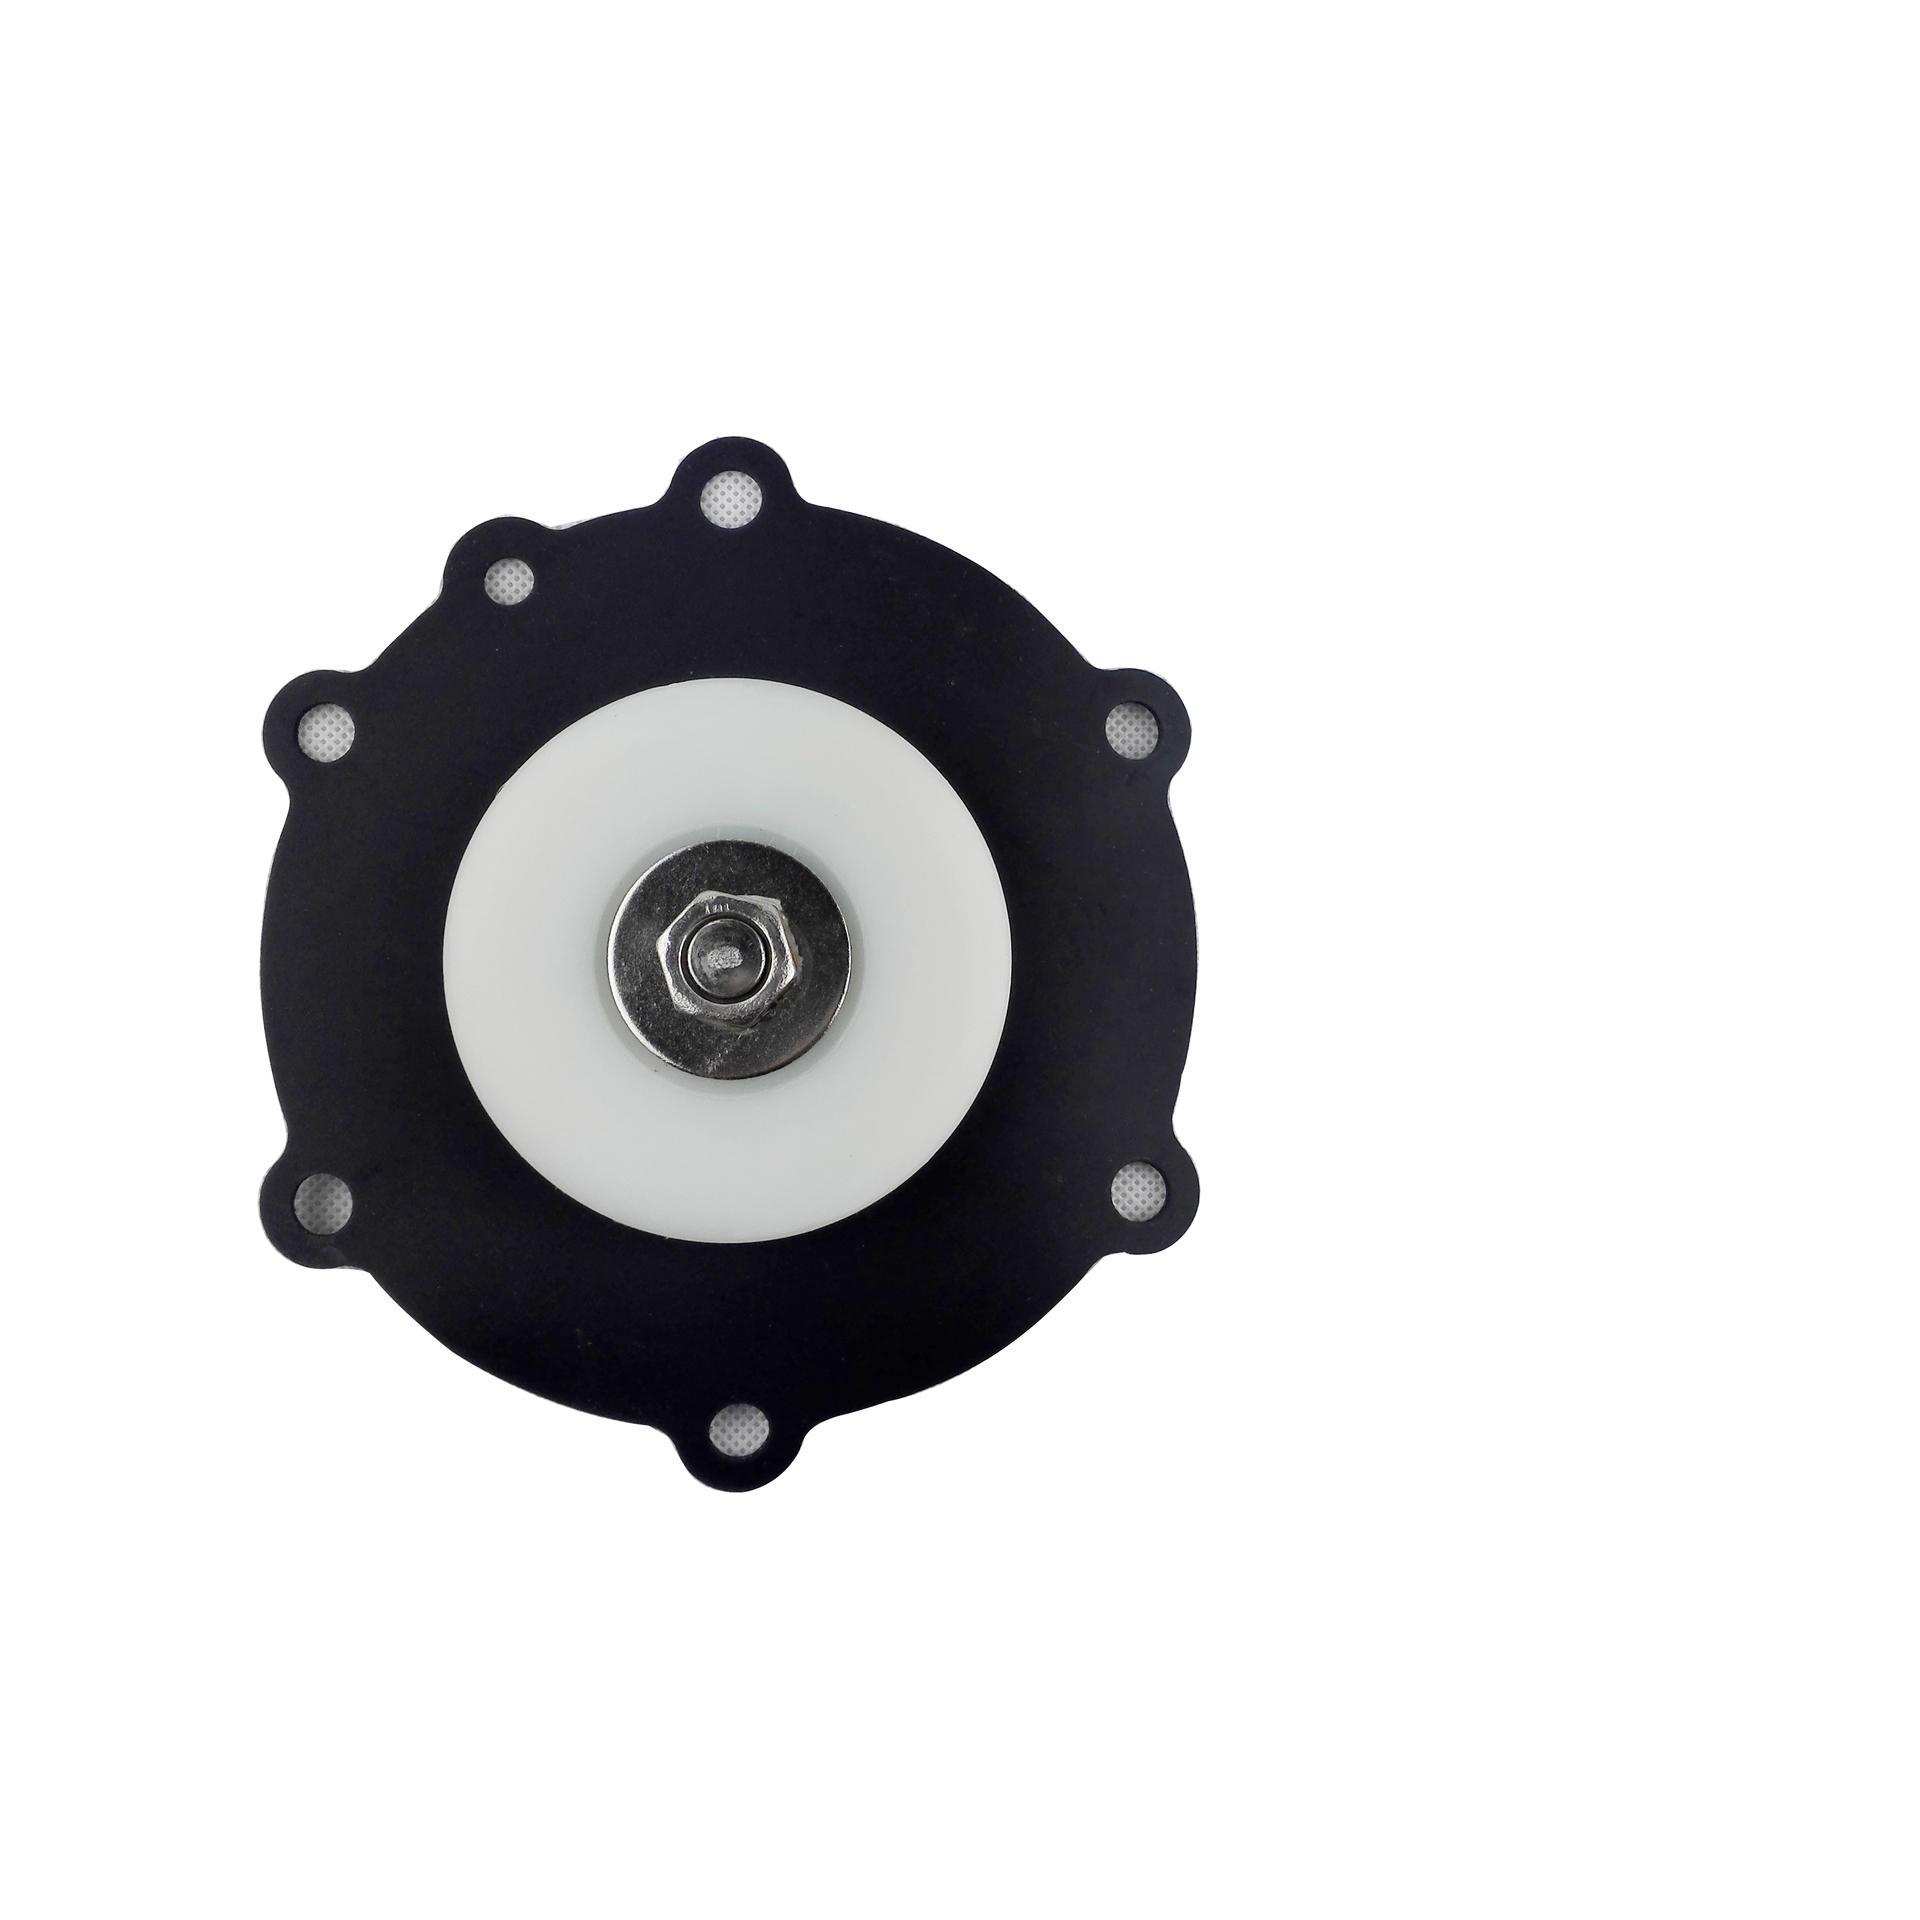 JISI 50 Pulse valve diaphragmNitrilediaphragm 2 inchJISI/JISR50dust collect solenoid valve